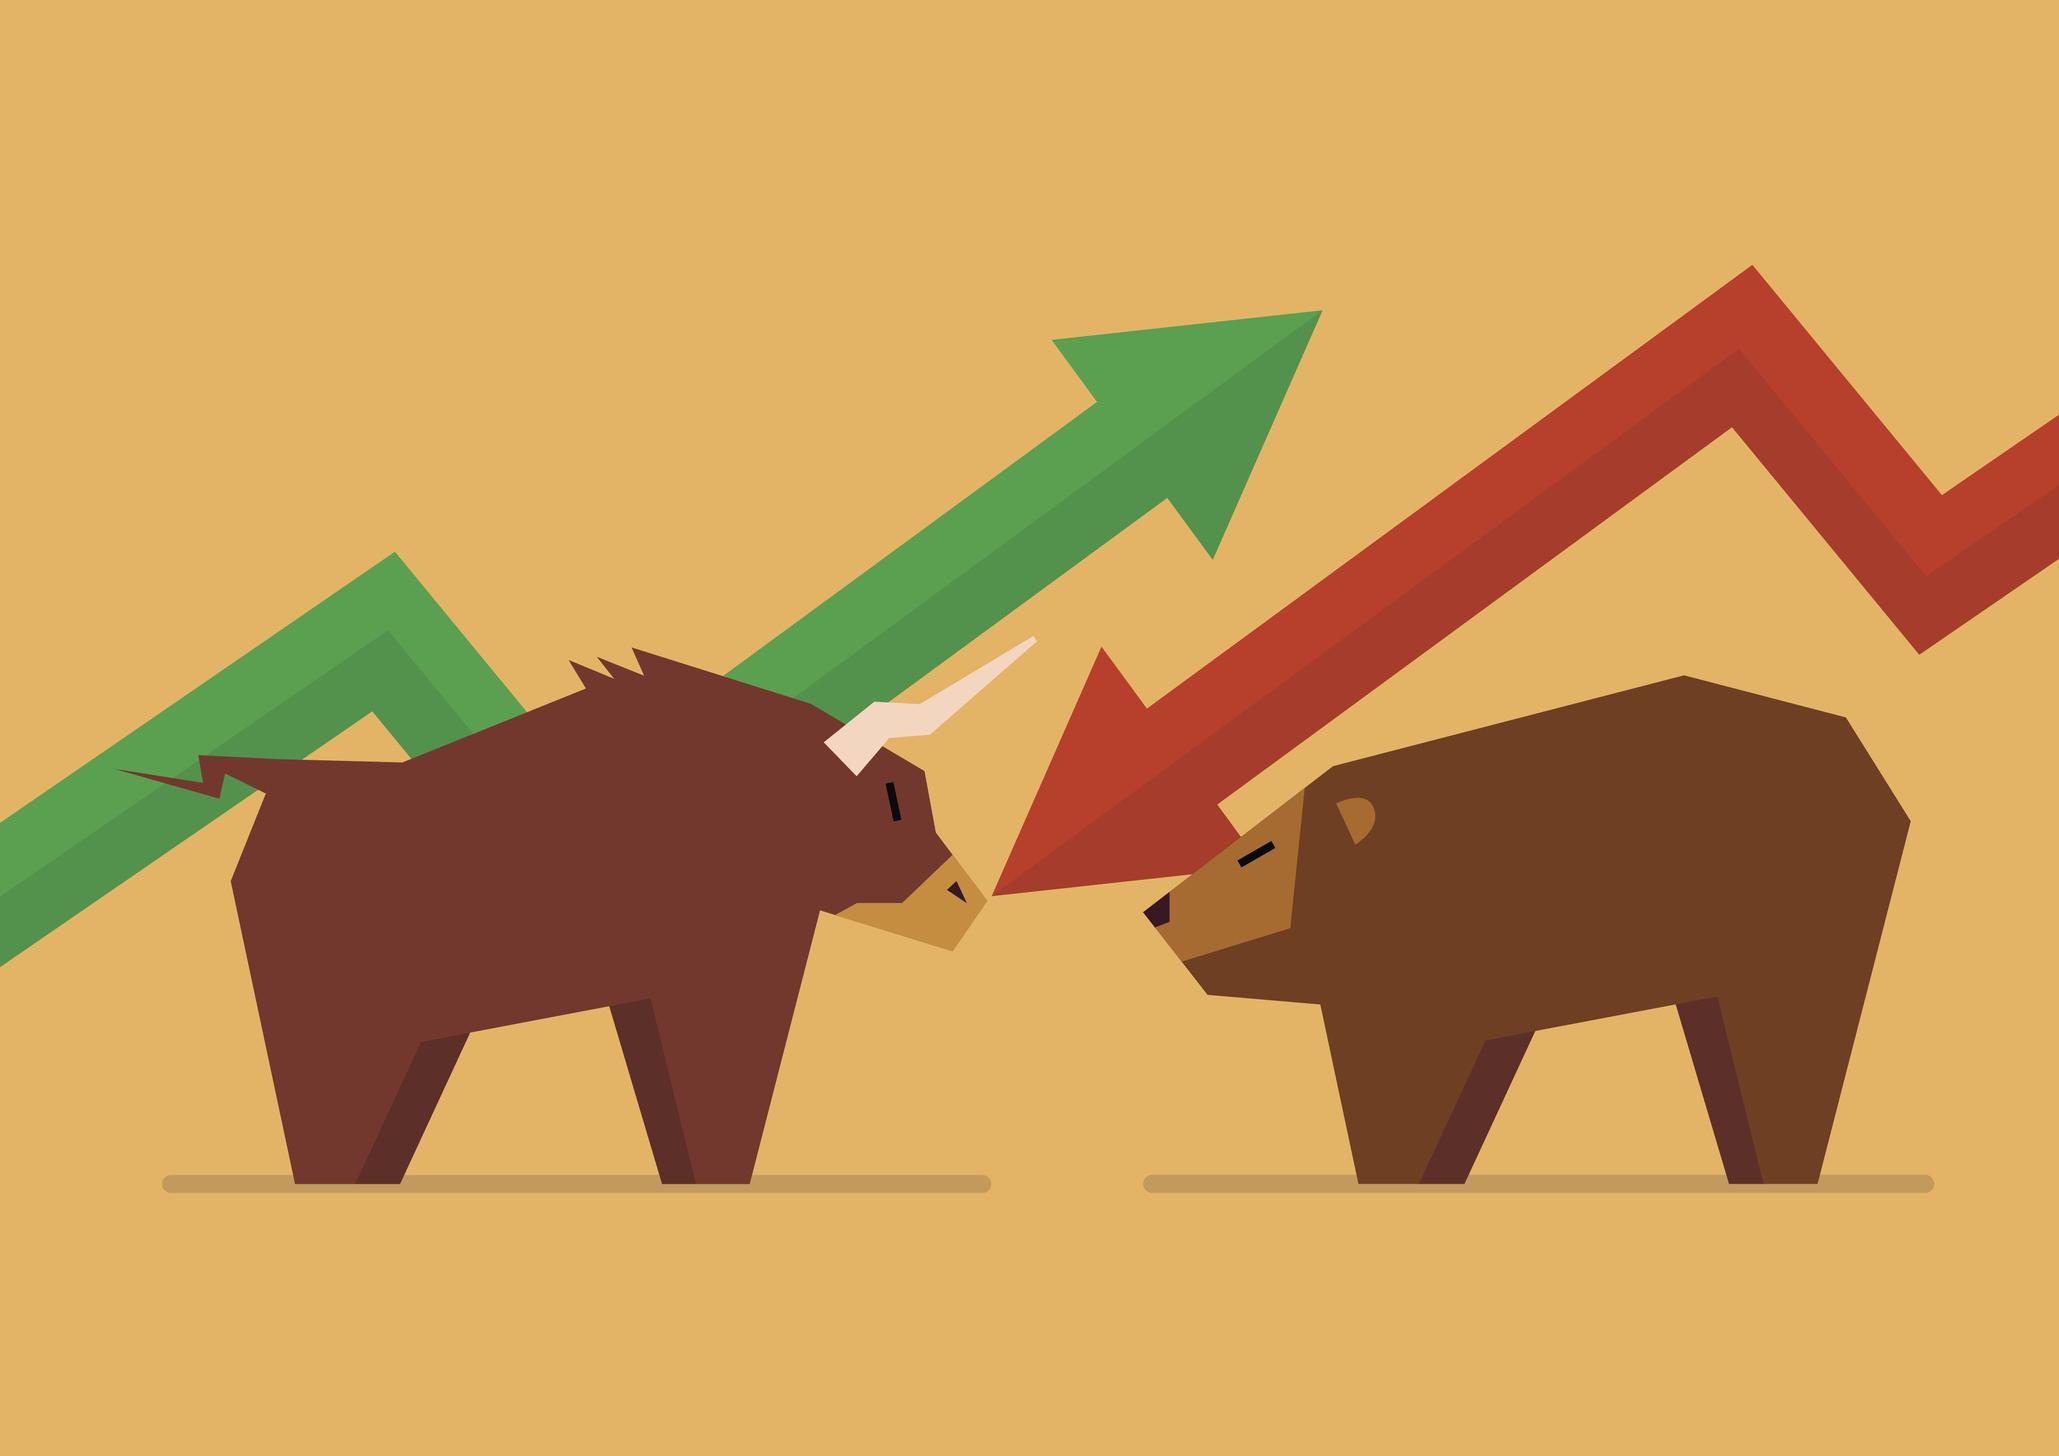 Cartoon bull facing cartoon bear under green and red stock arrows